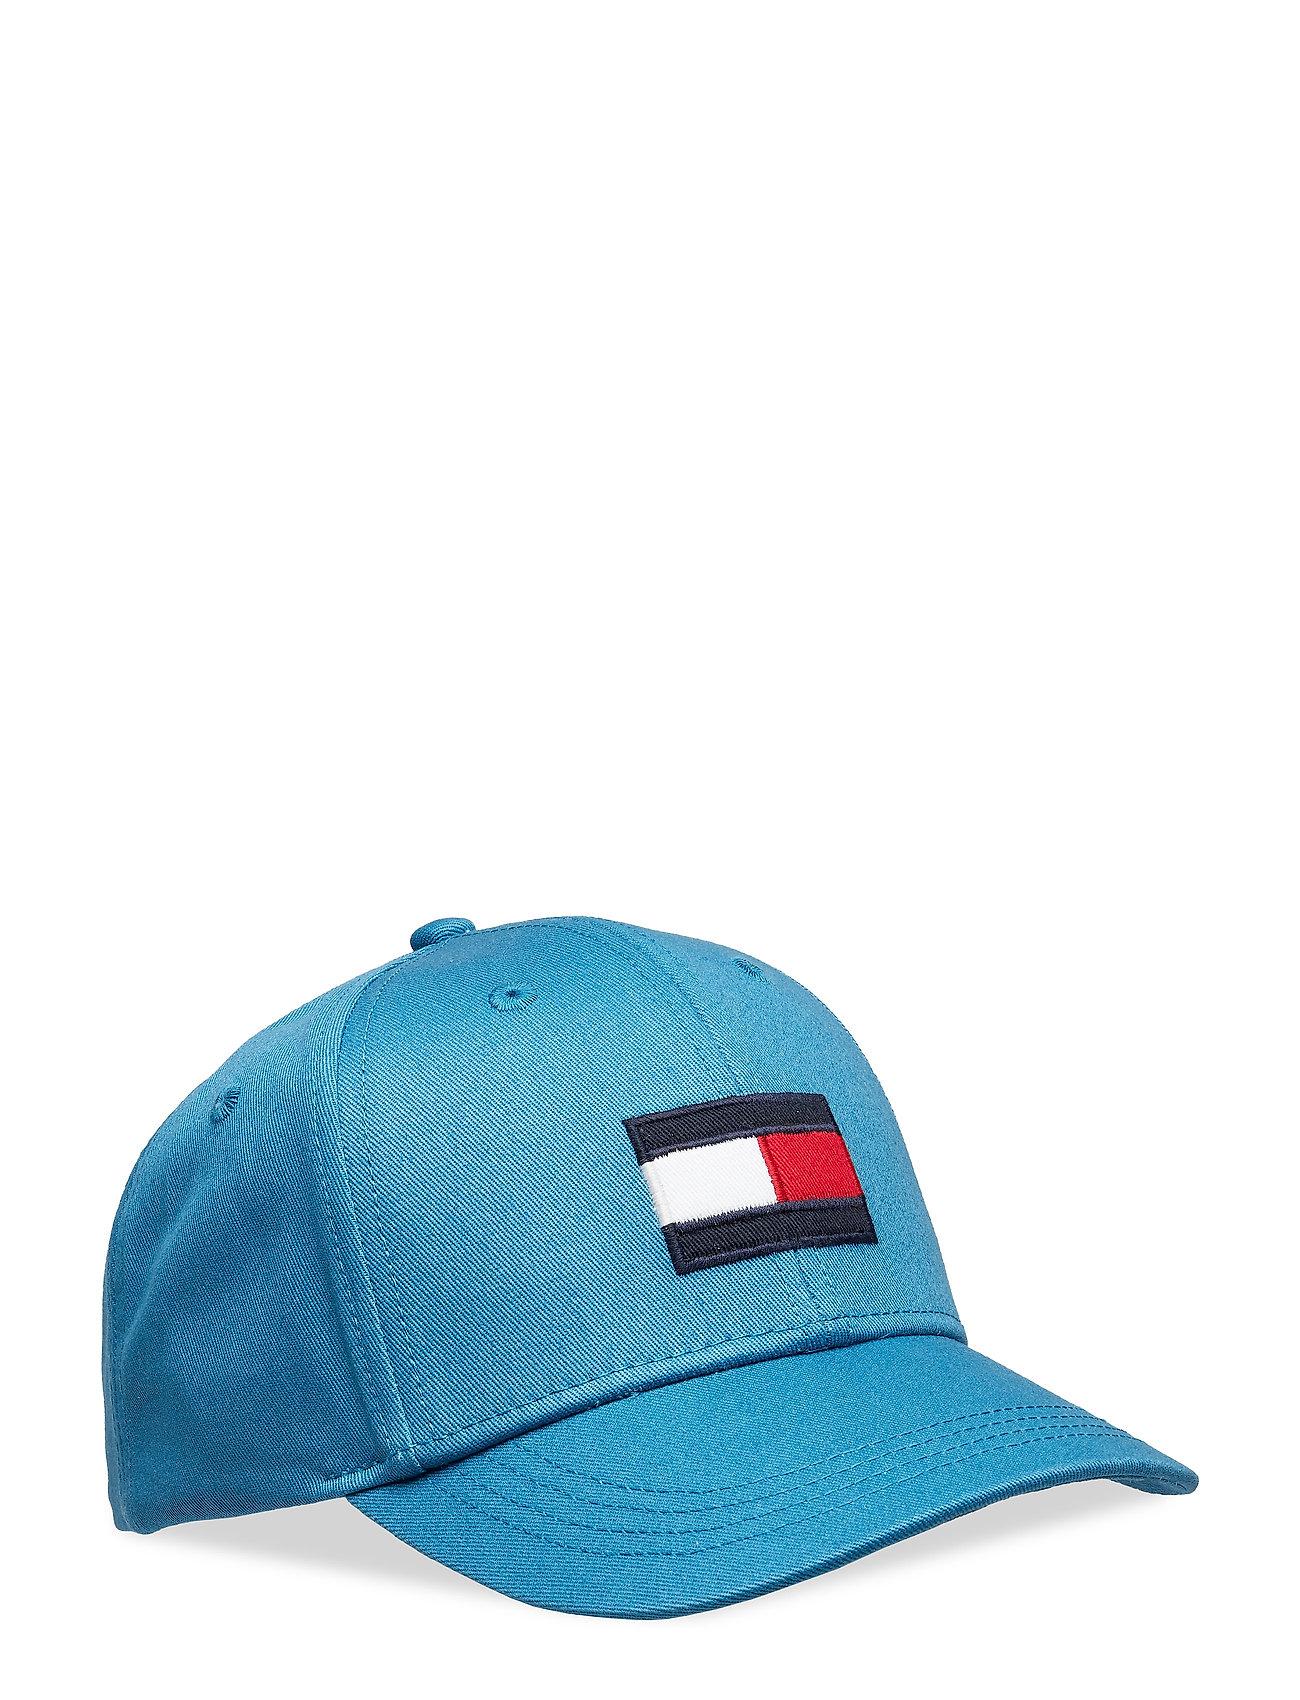 Tommy Hilfiger BIG FLAG CAP - SAXONY BLUE